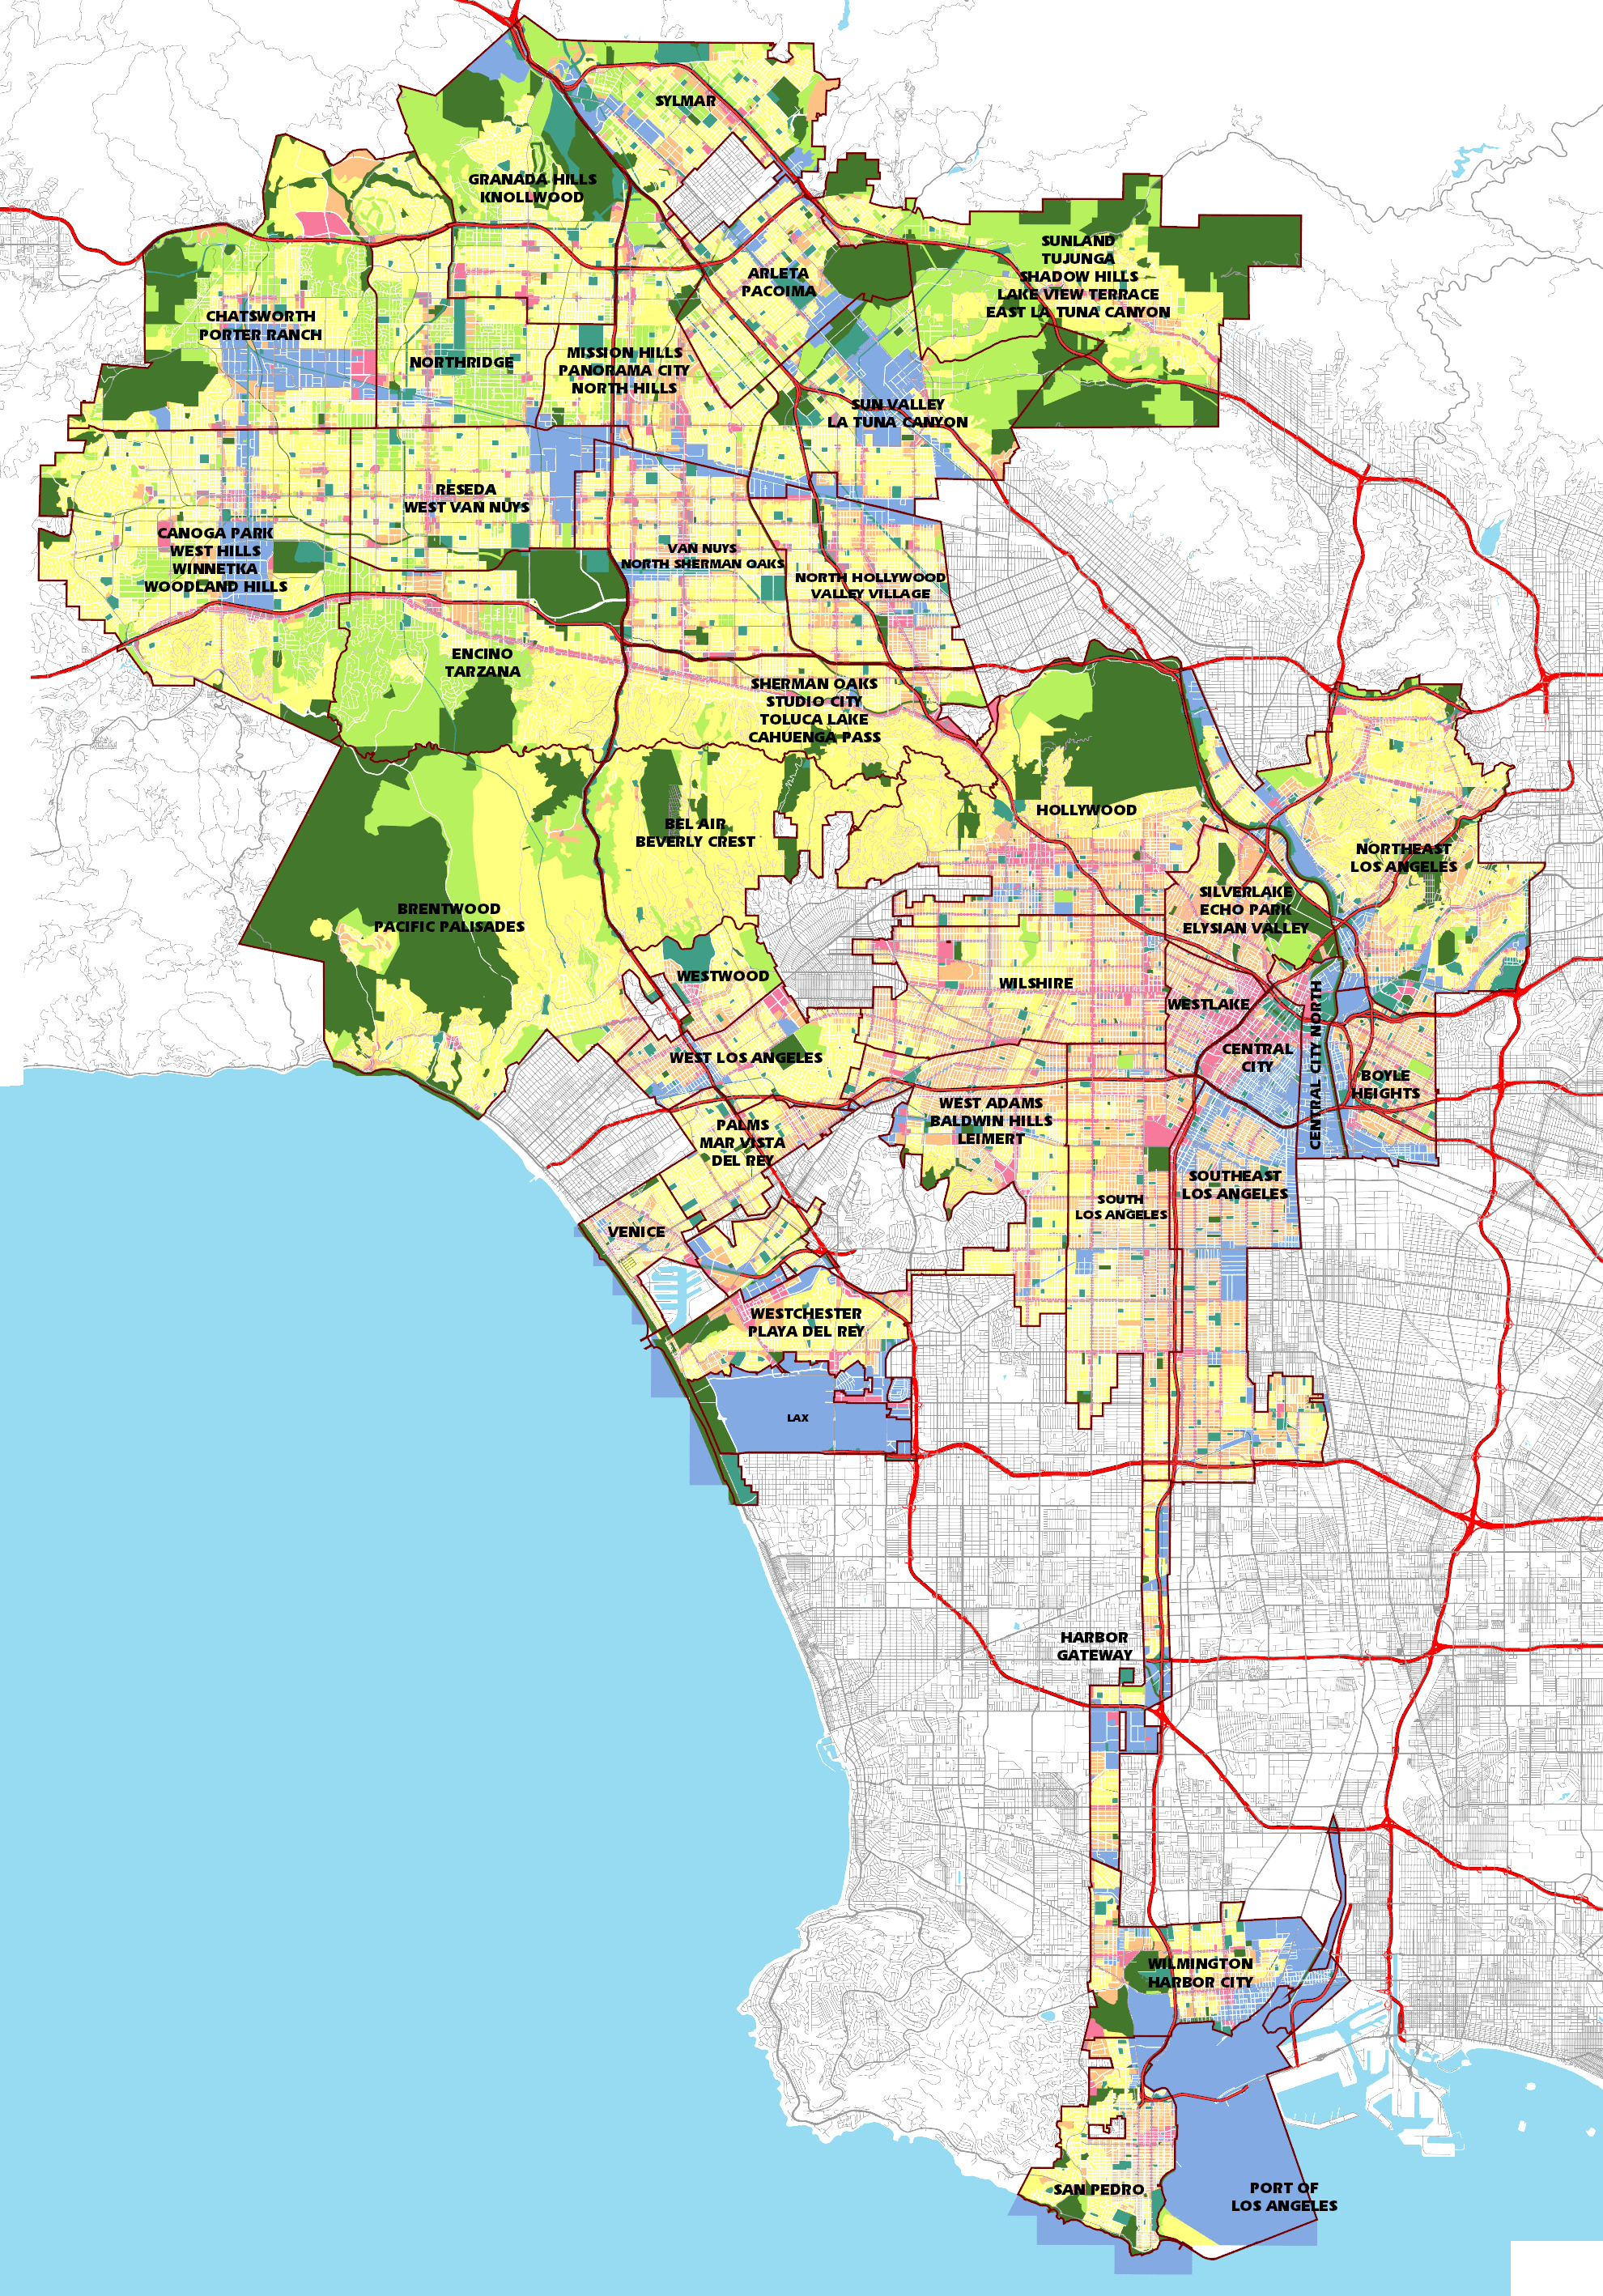 Granada Hills California Map - Klipy - Granada Hills California Map